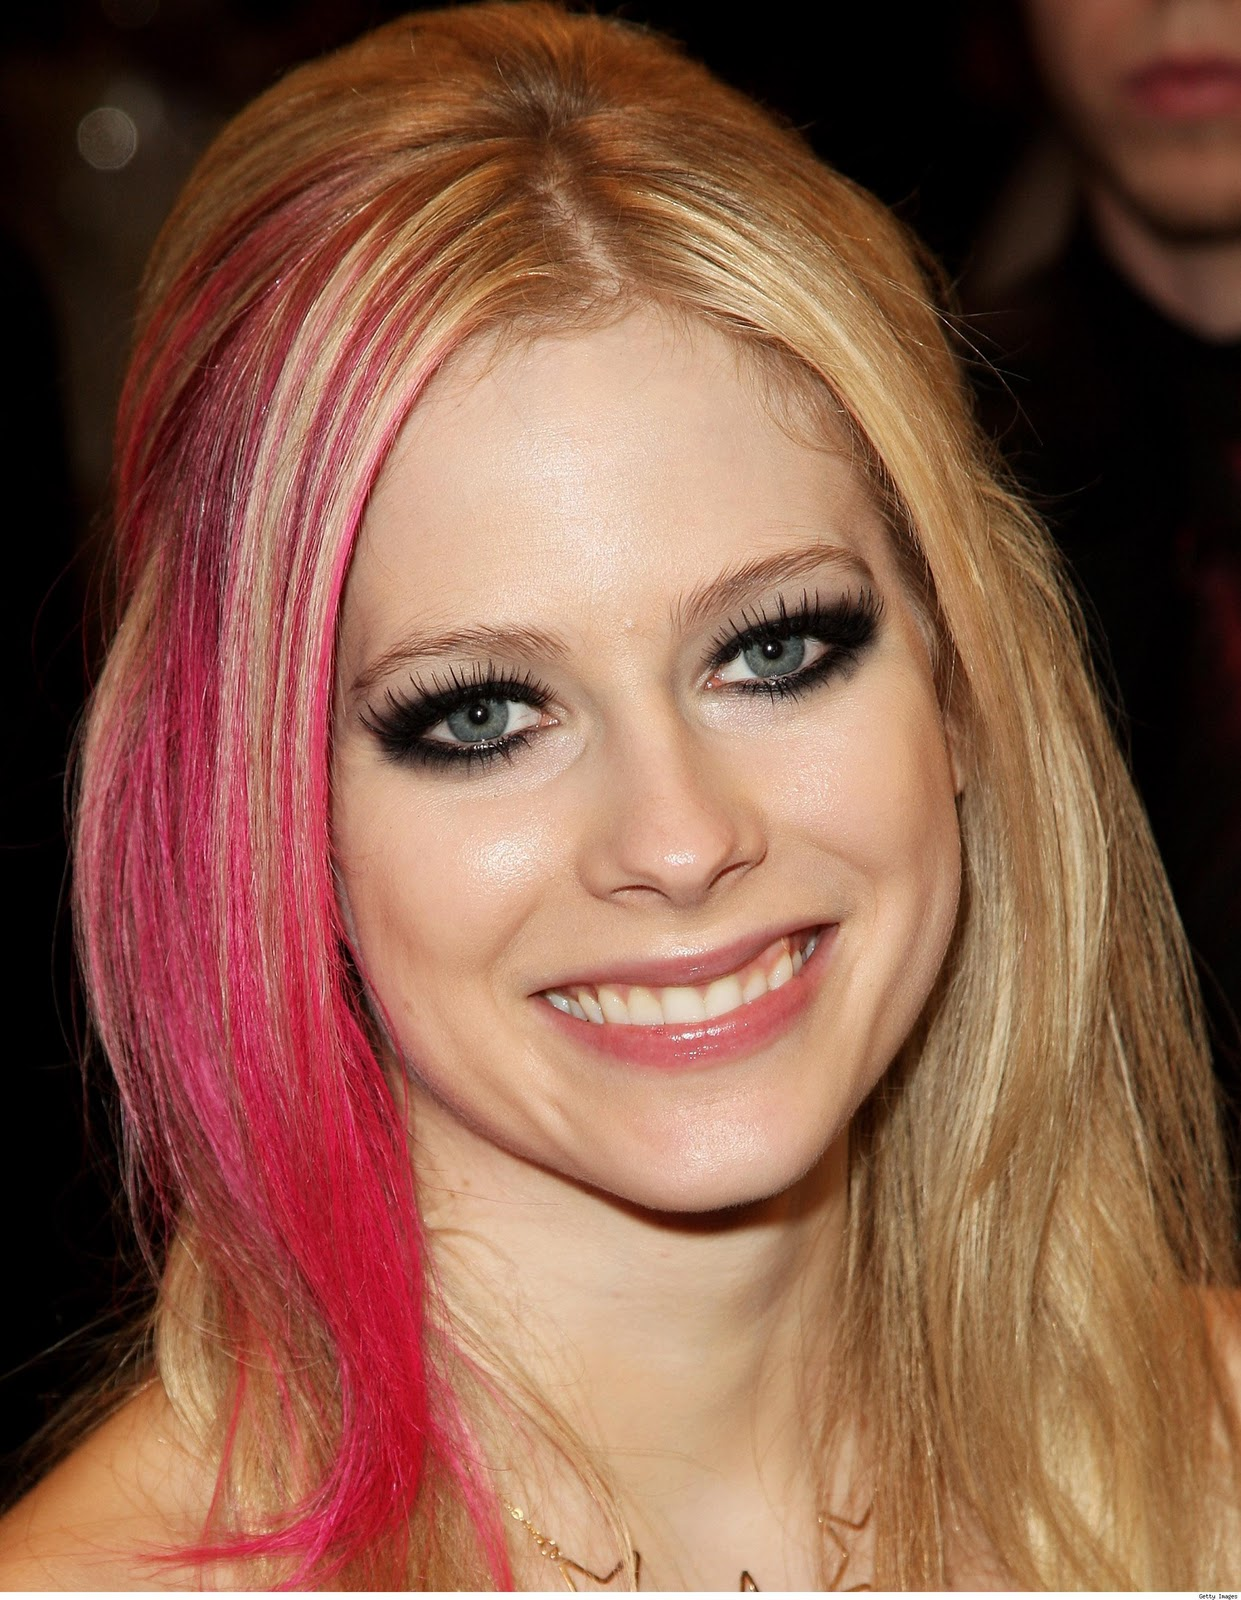 http://3.bp.blogspot.com/_jPsUHRPlxFw/TRV2YMfCykI/AAAAAAAACC4/YhrUiM0zQ98/s1600/Avril+Lavigne-pink.jpg